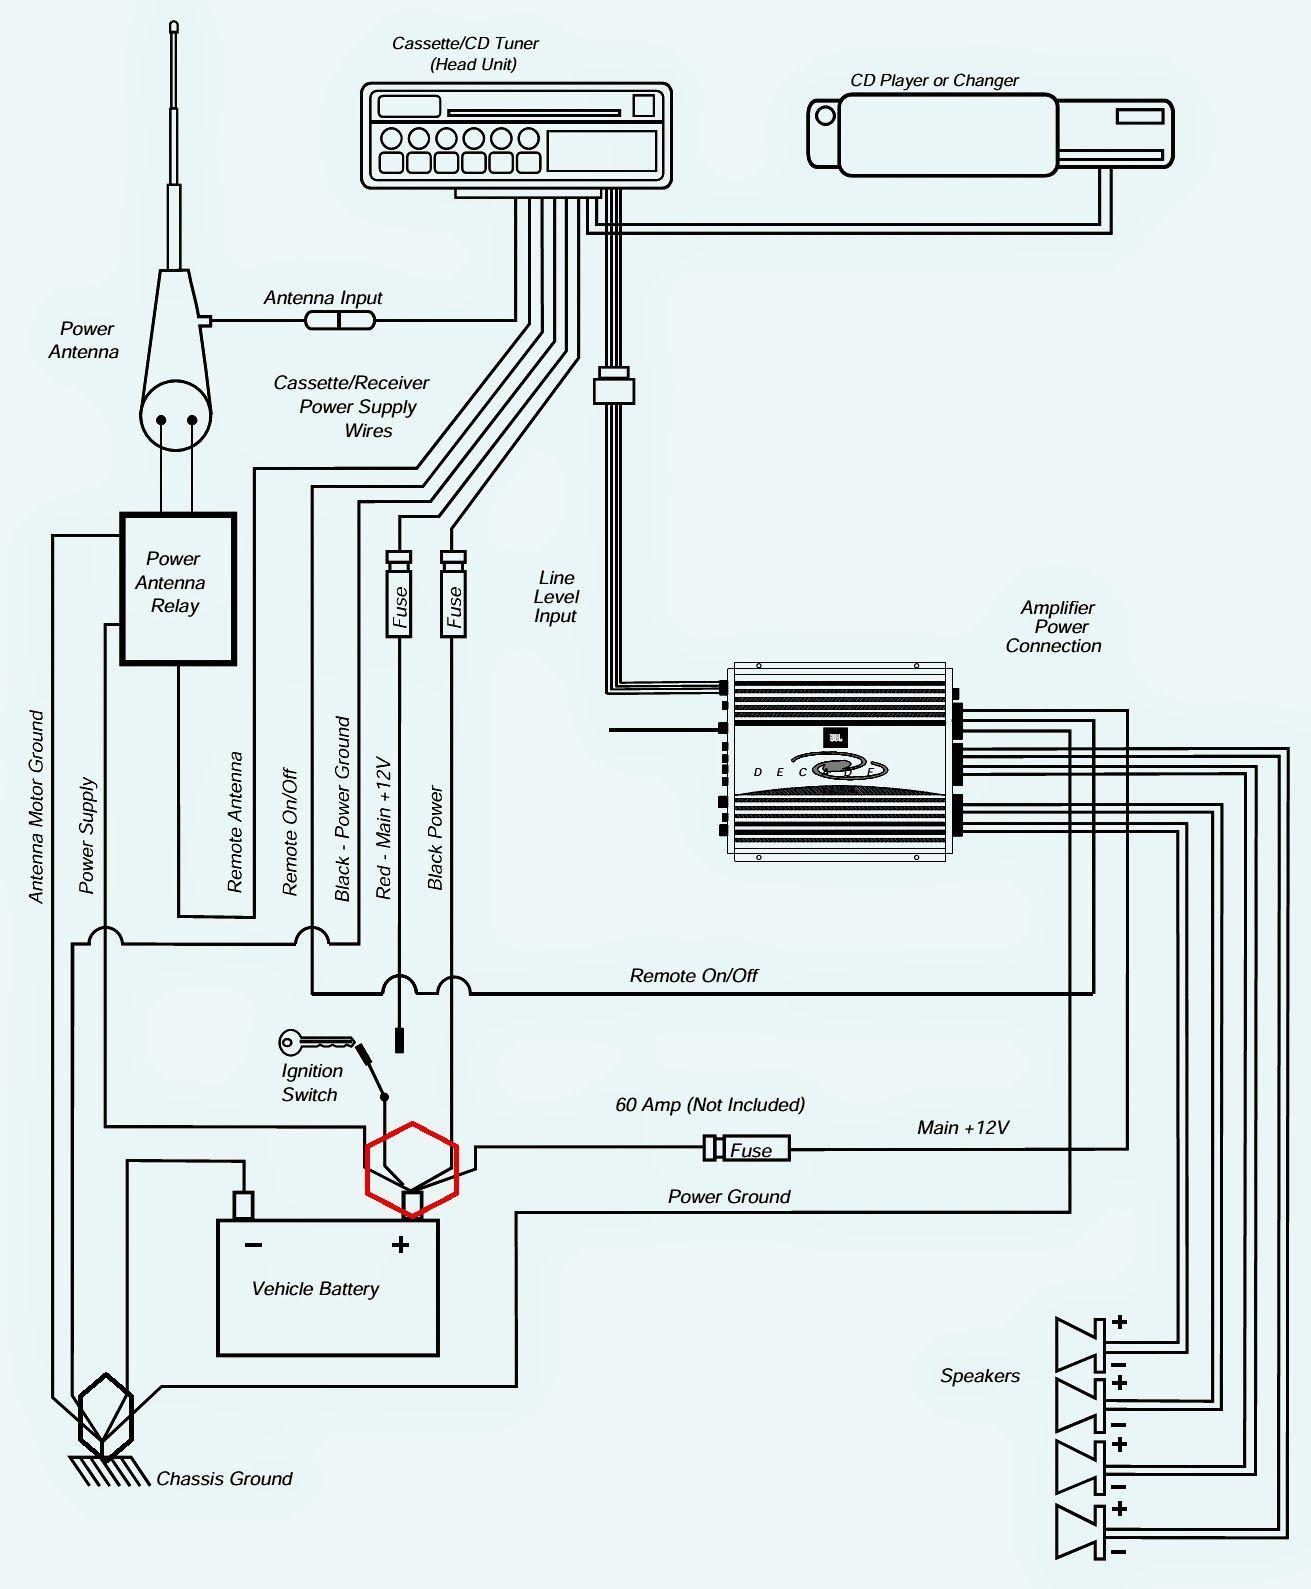 17 Good Sample Of Toyota Jbl Amplifier Wiring Diagram